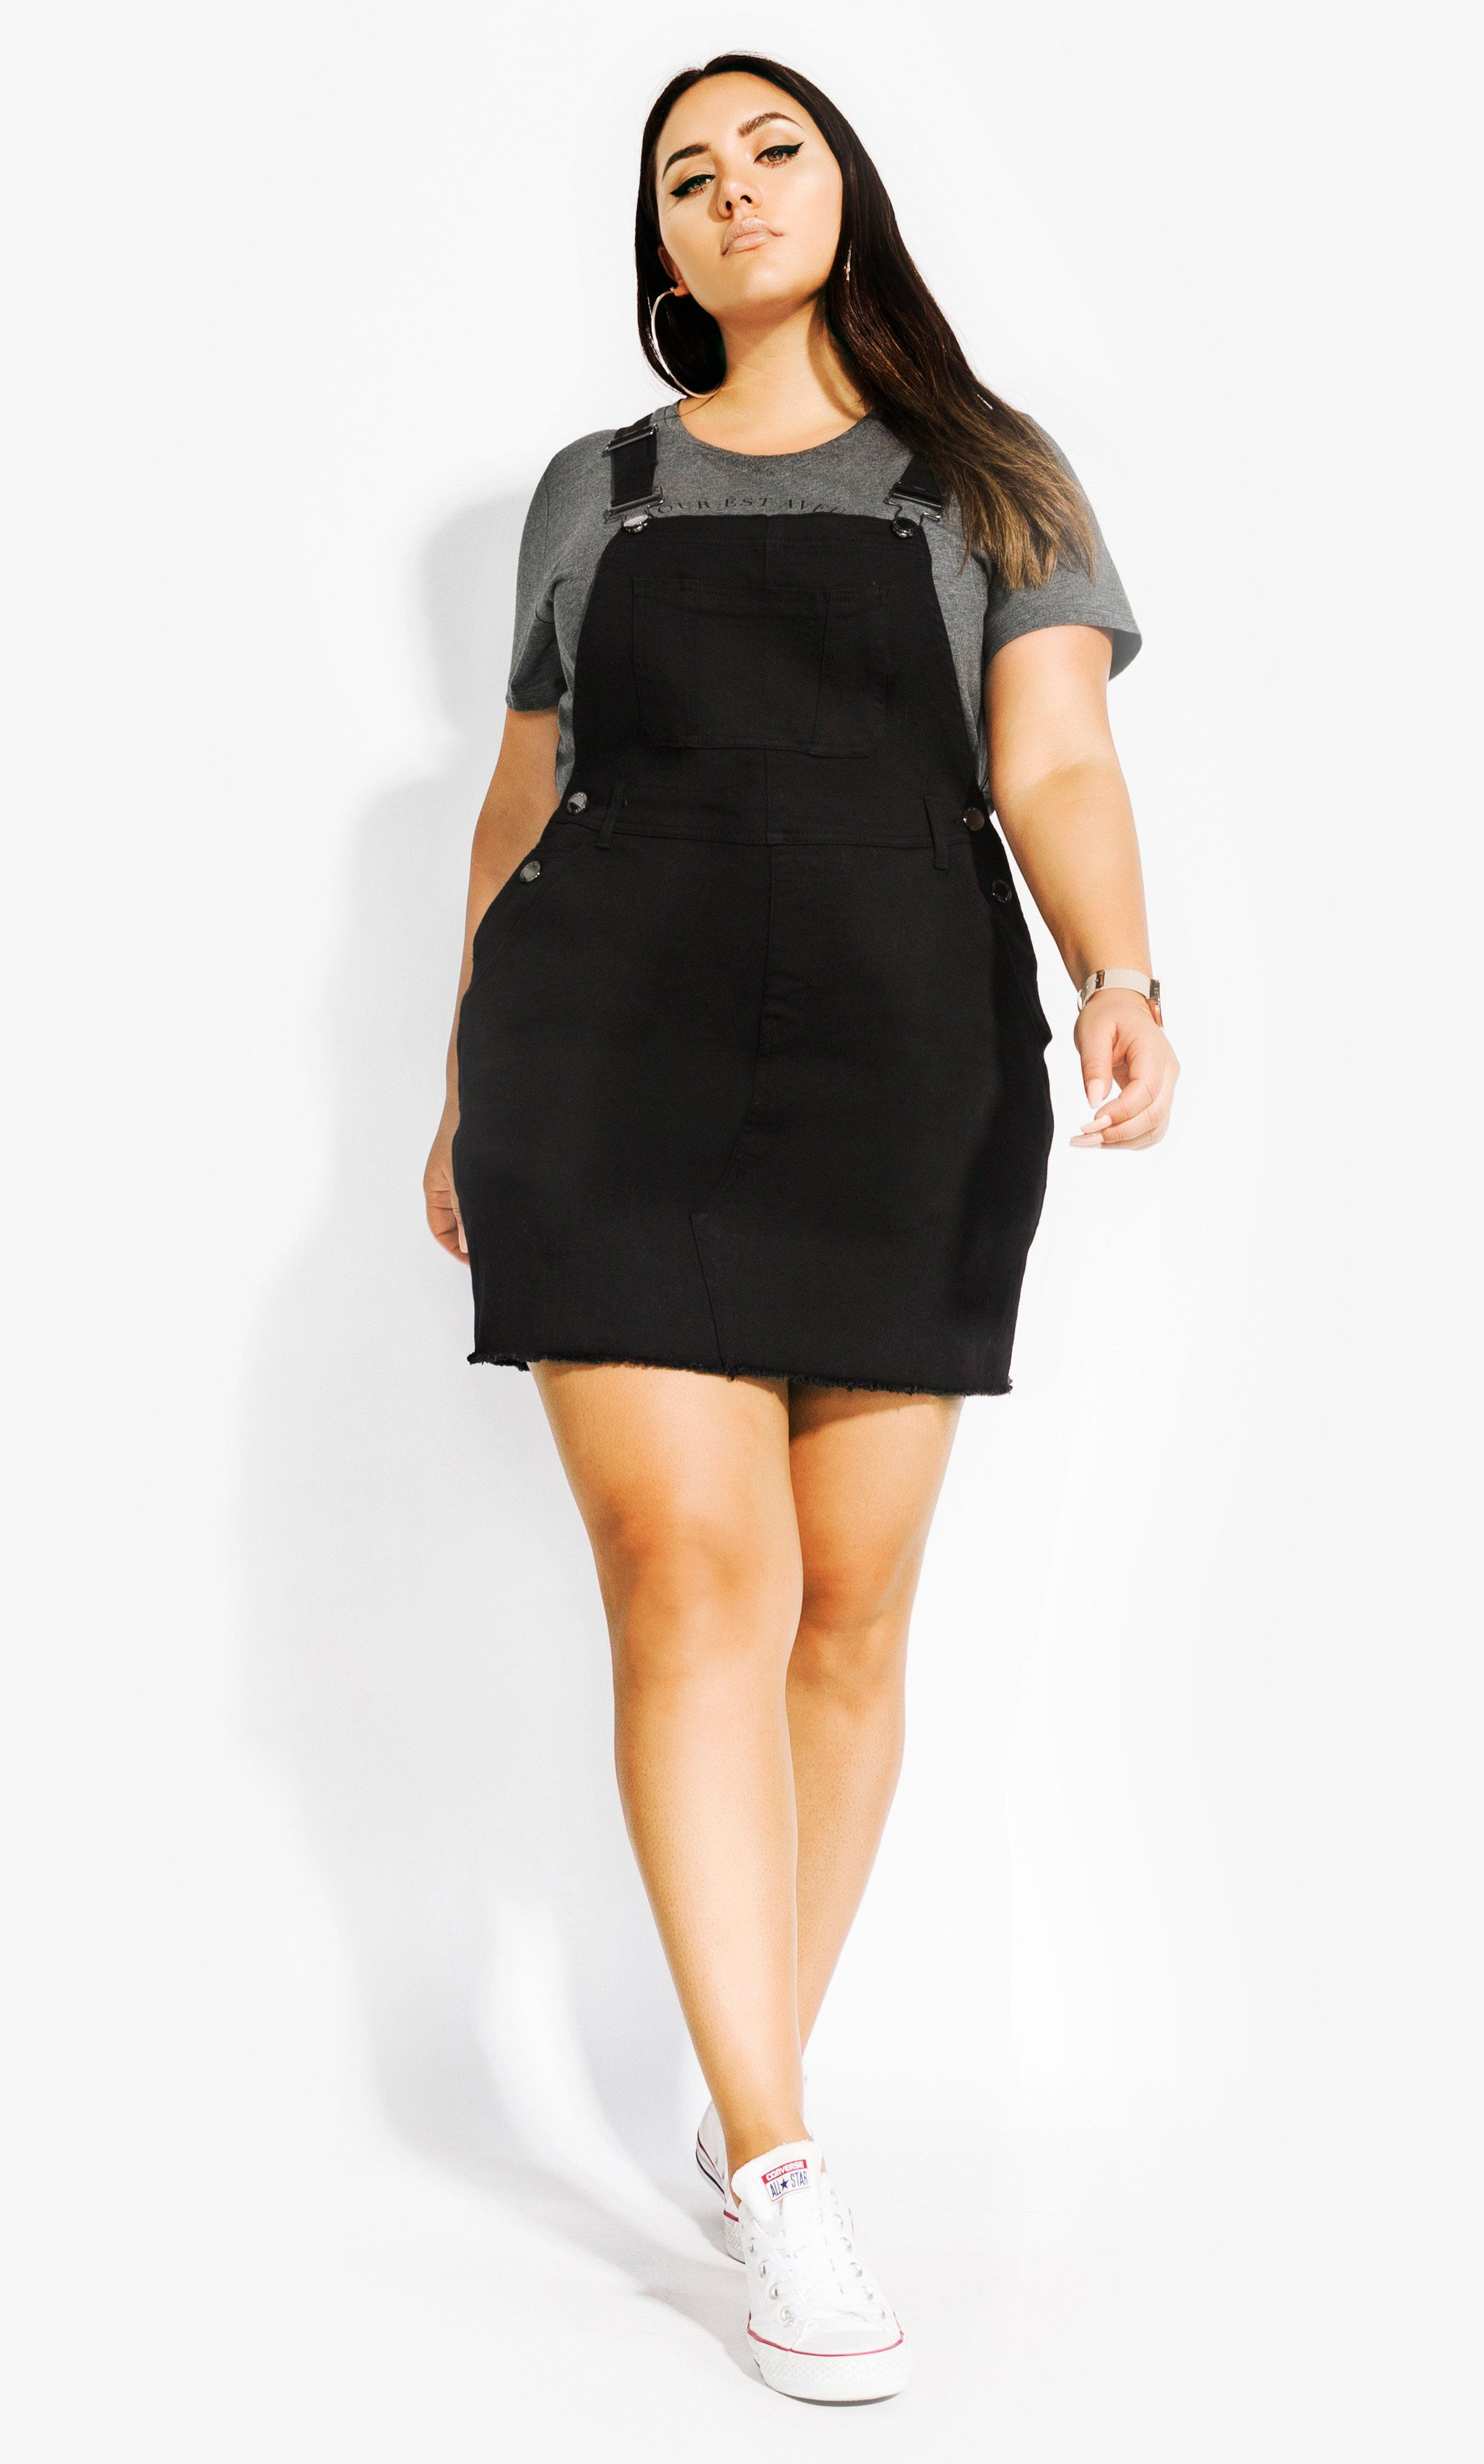 Denim Bib Dress Black Plus Size Outfits Curvy Outfits Outfits Gorditas [ 3984 x 2400 Pixel ]